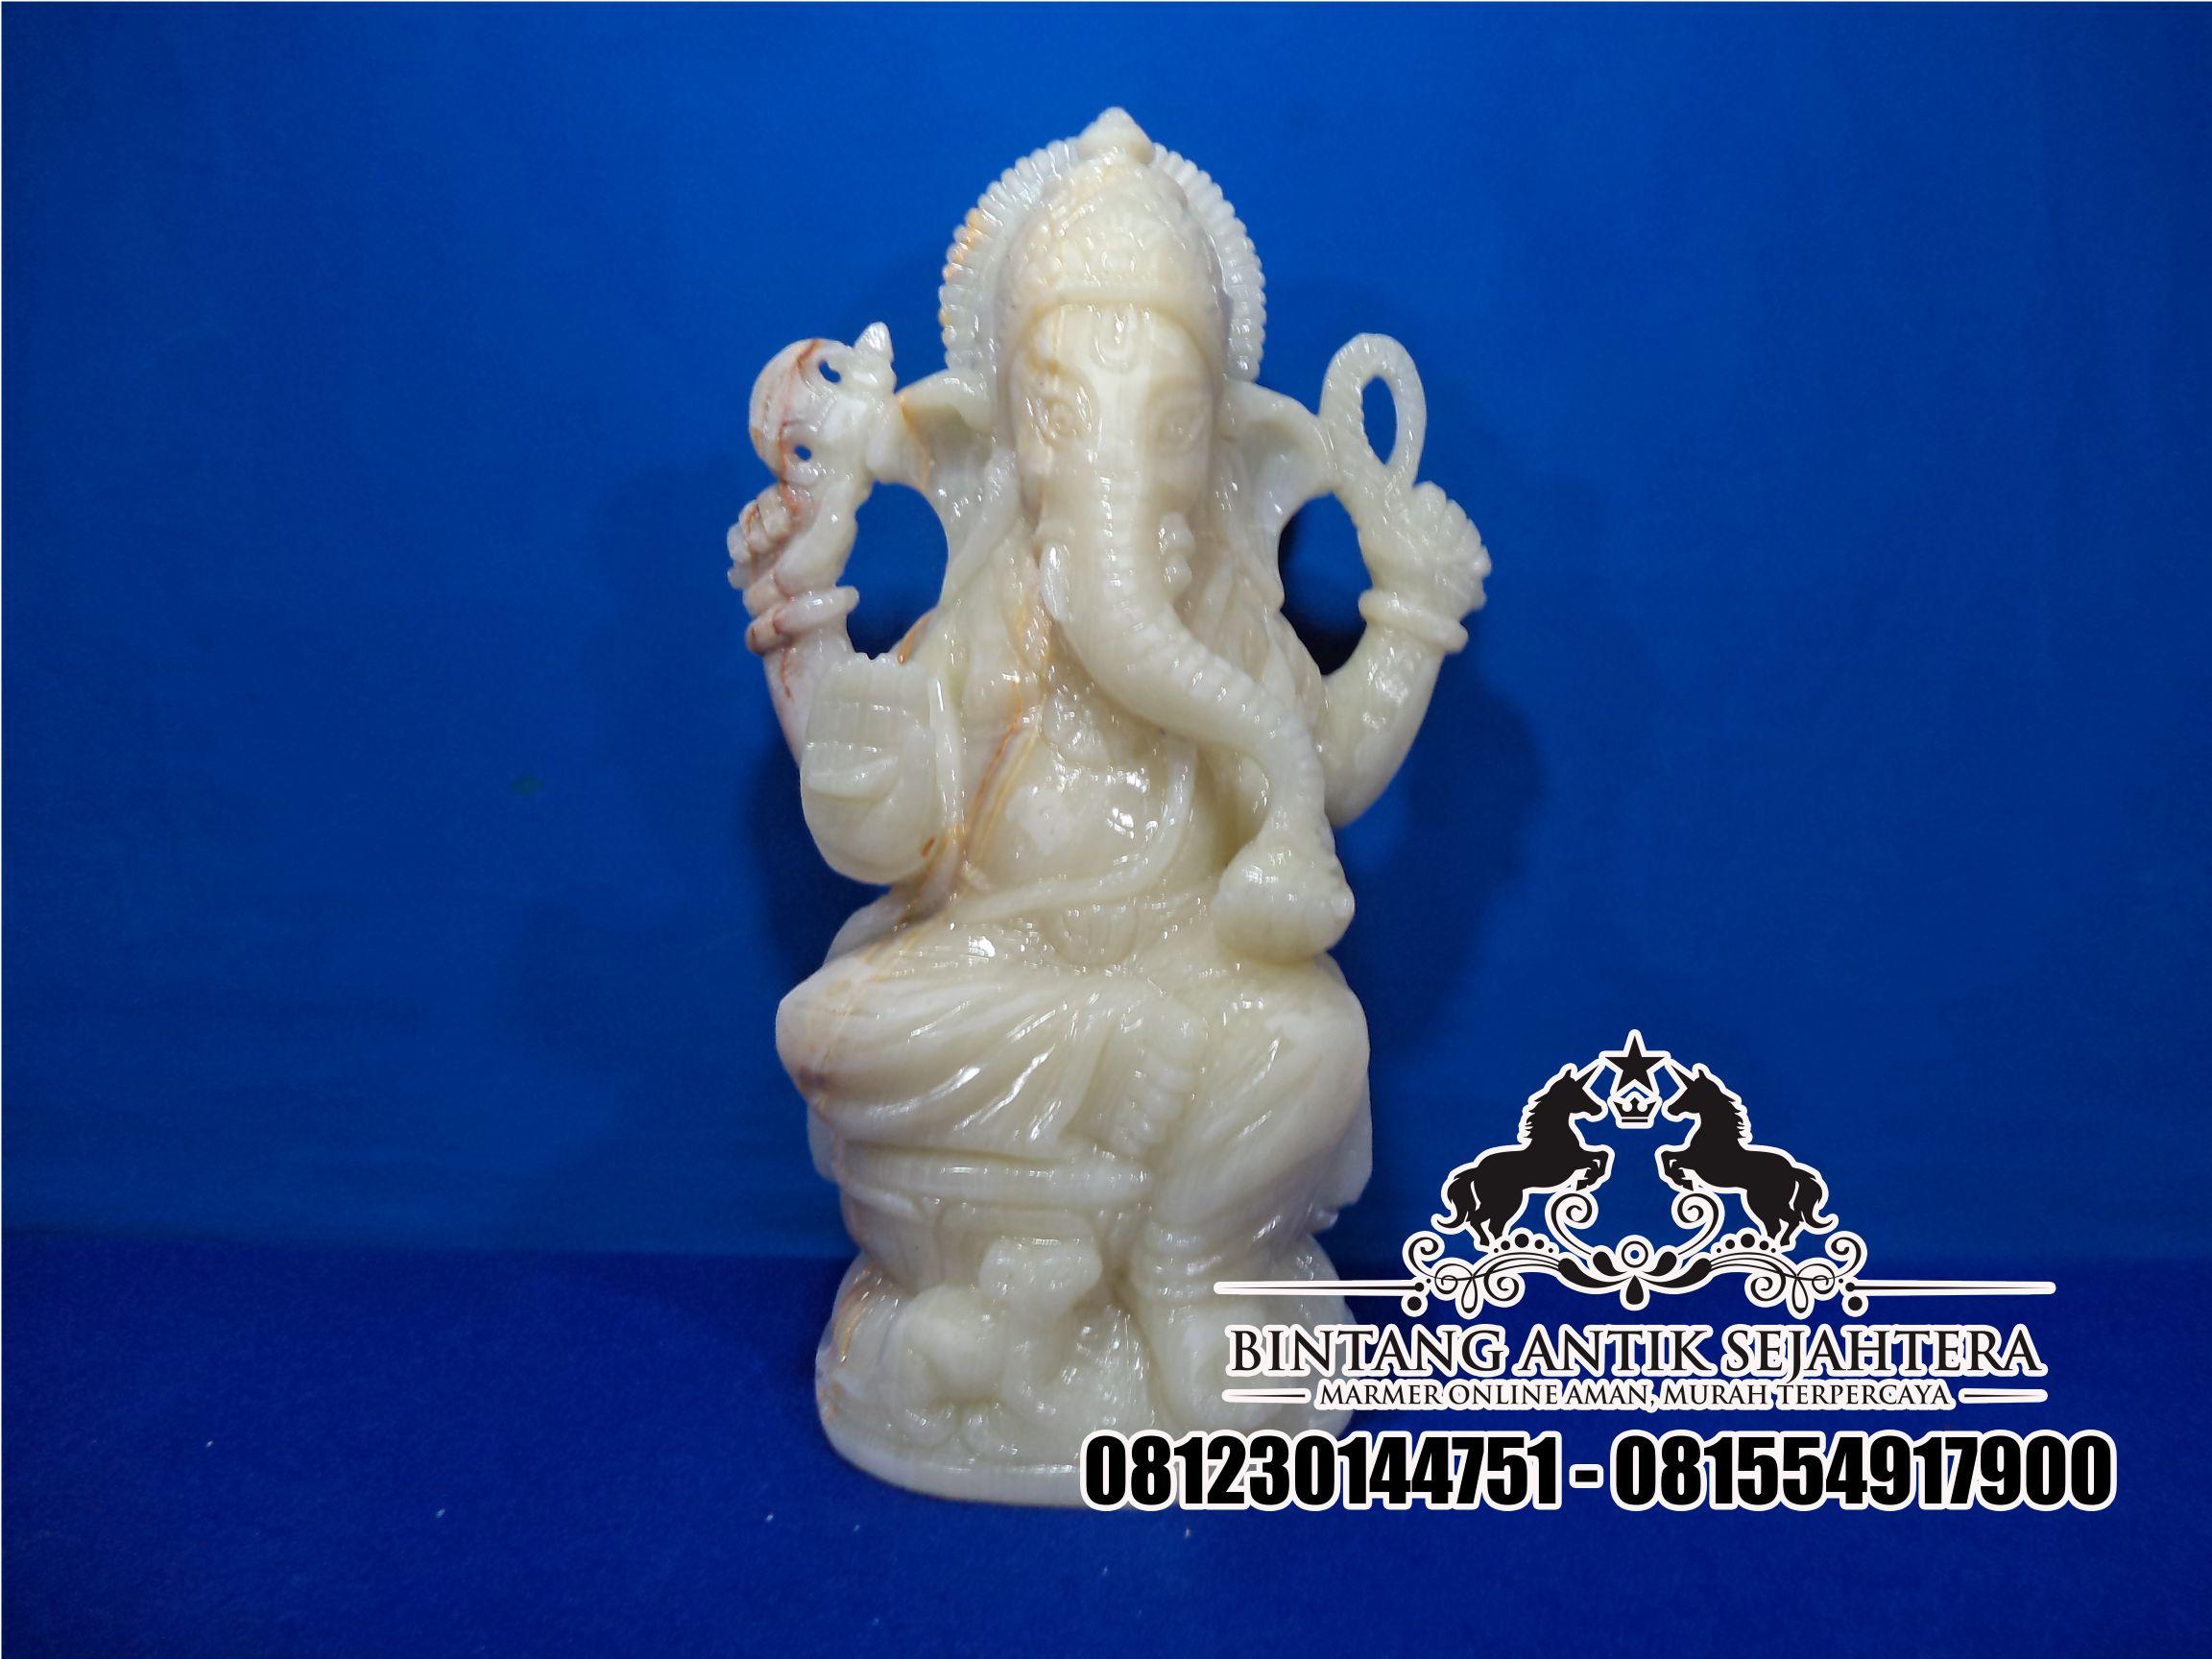 Harga Patung Onix, Patung Budha Onix